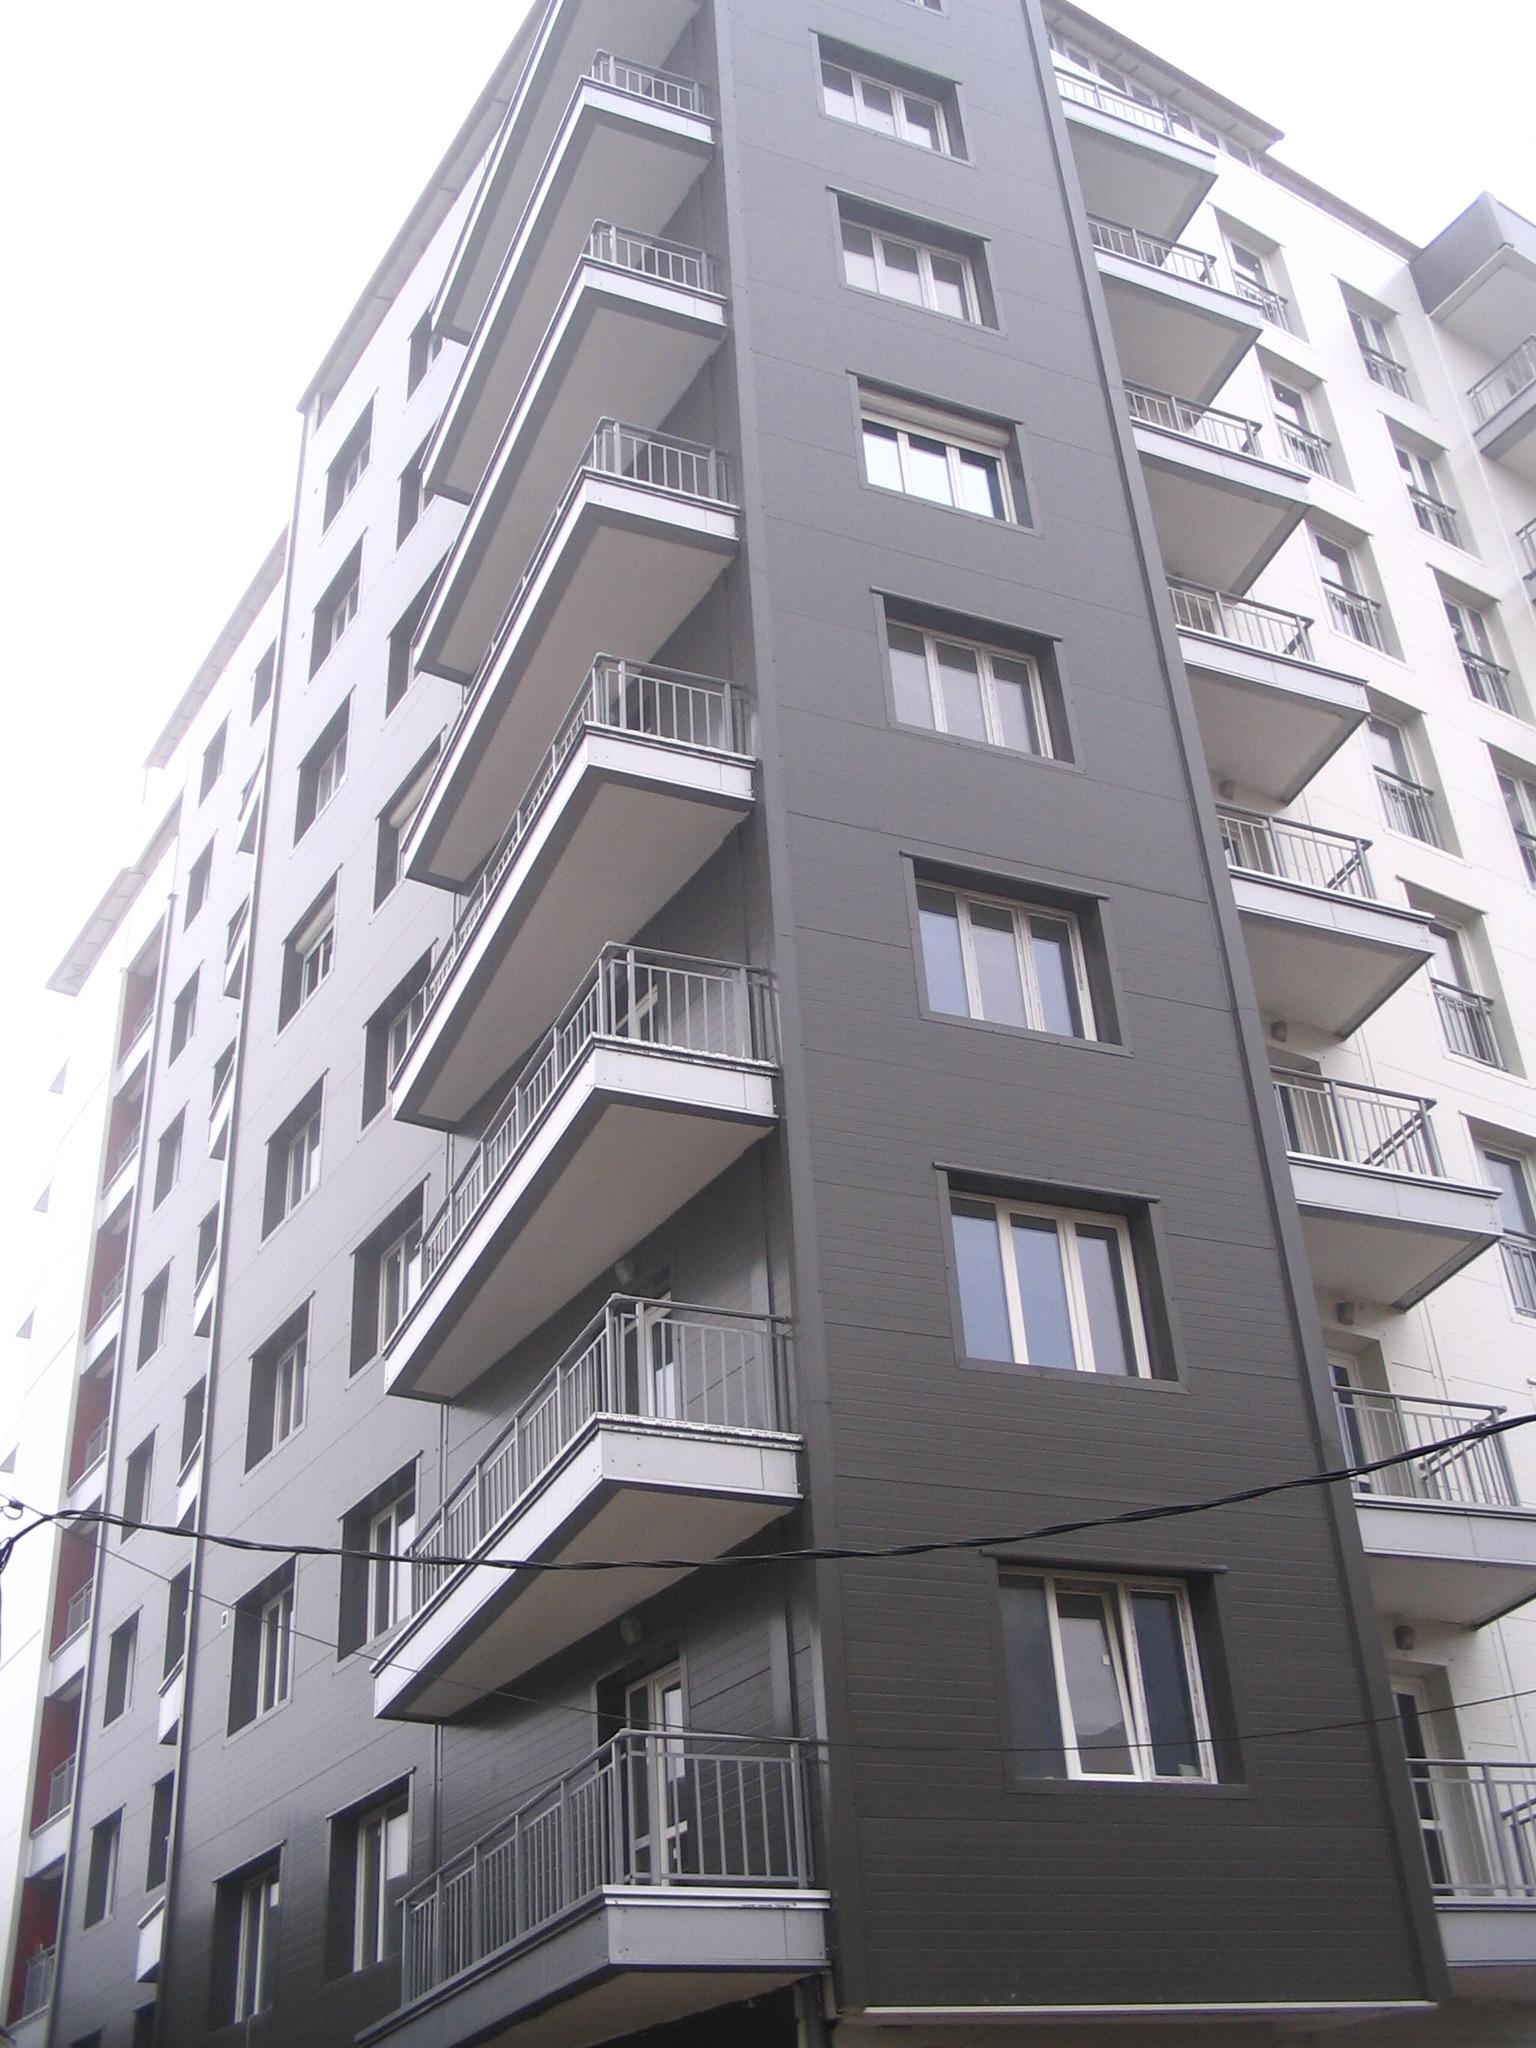 Ansamblu apartamente S+P+10 Str. Invingatorilor  - Poza 3